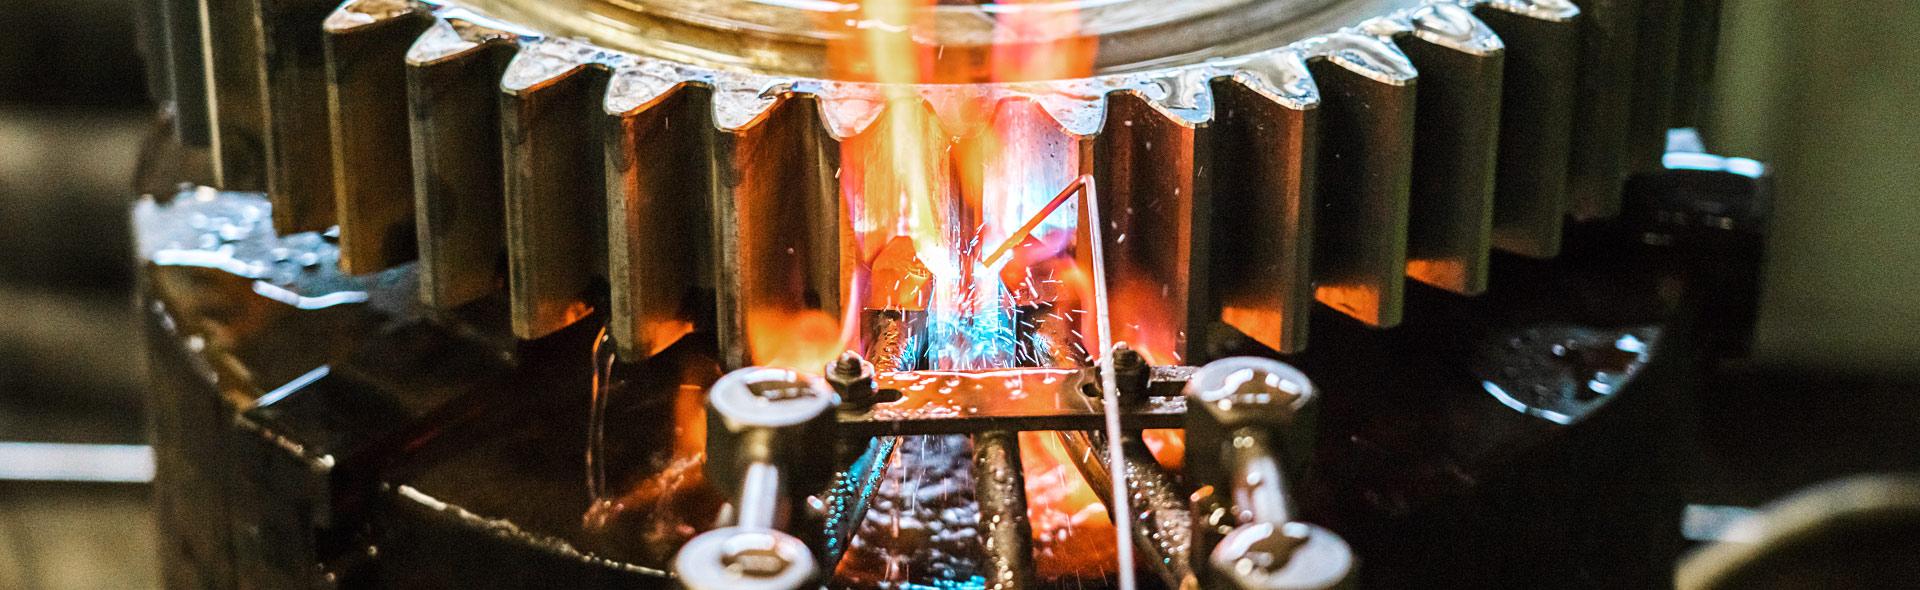 Wärmebehandlung   Maschinenbau Mundil GmbH